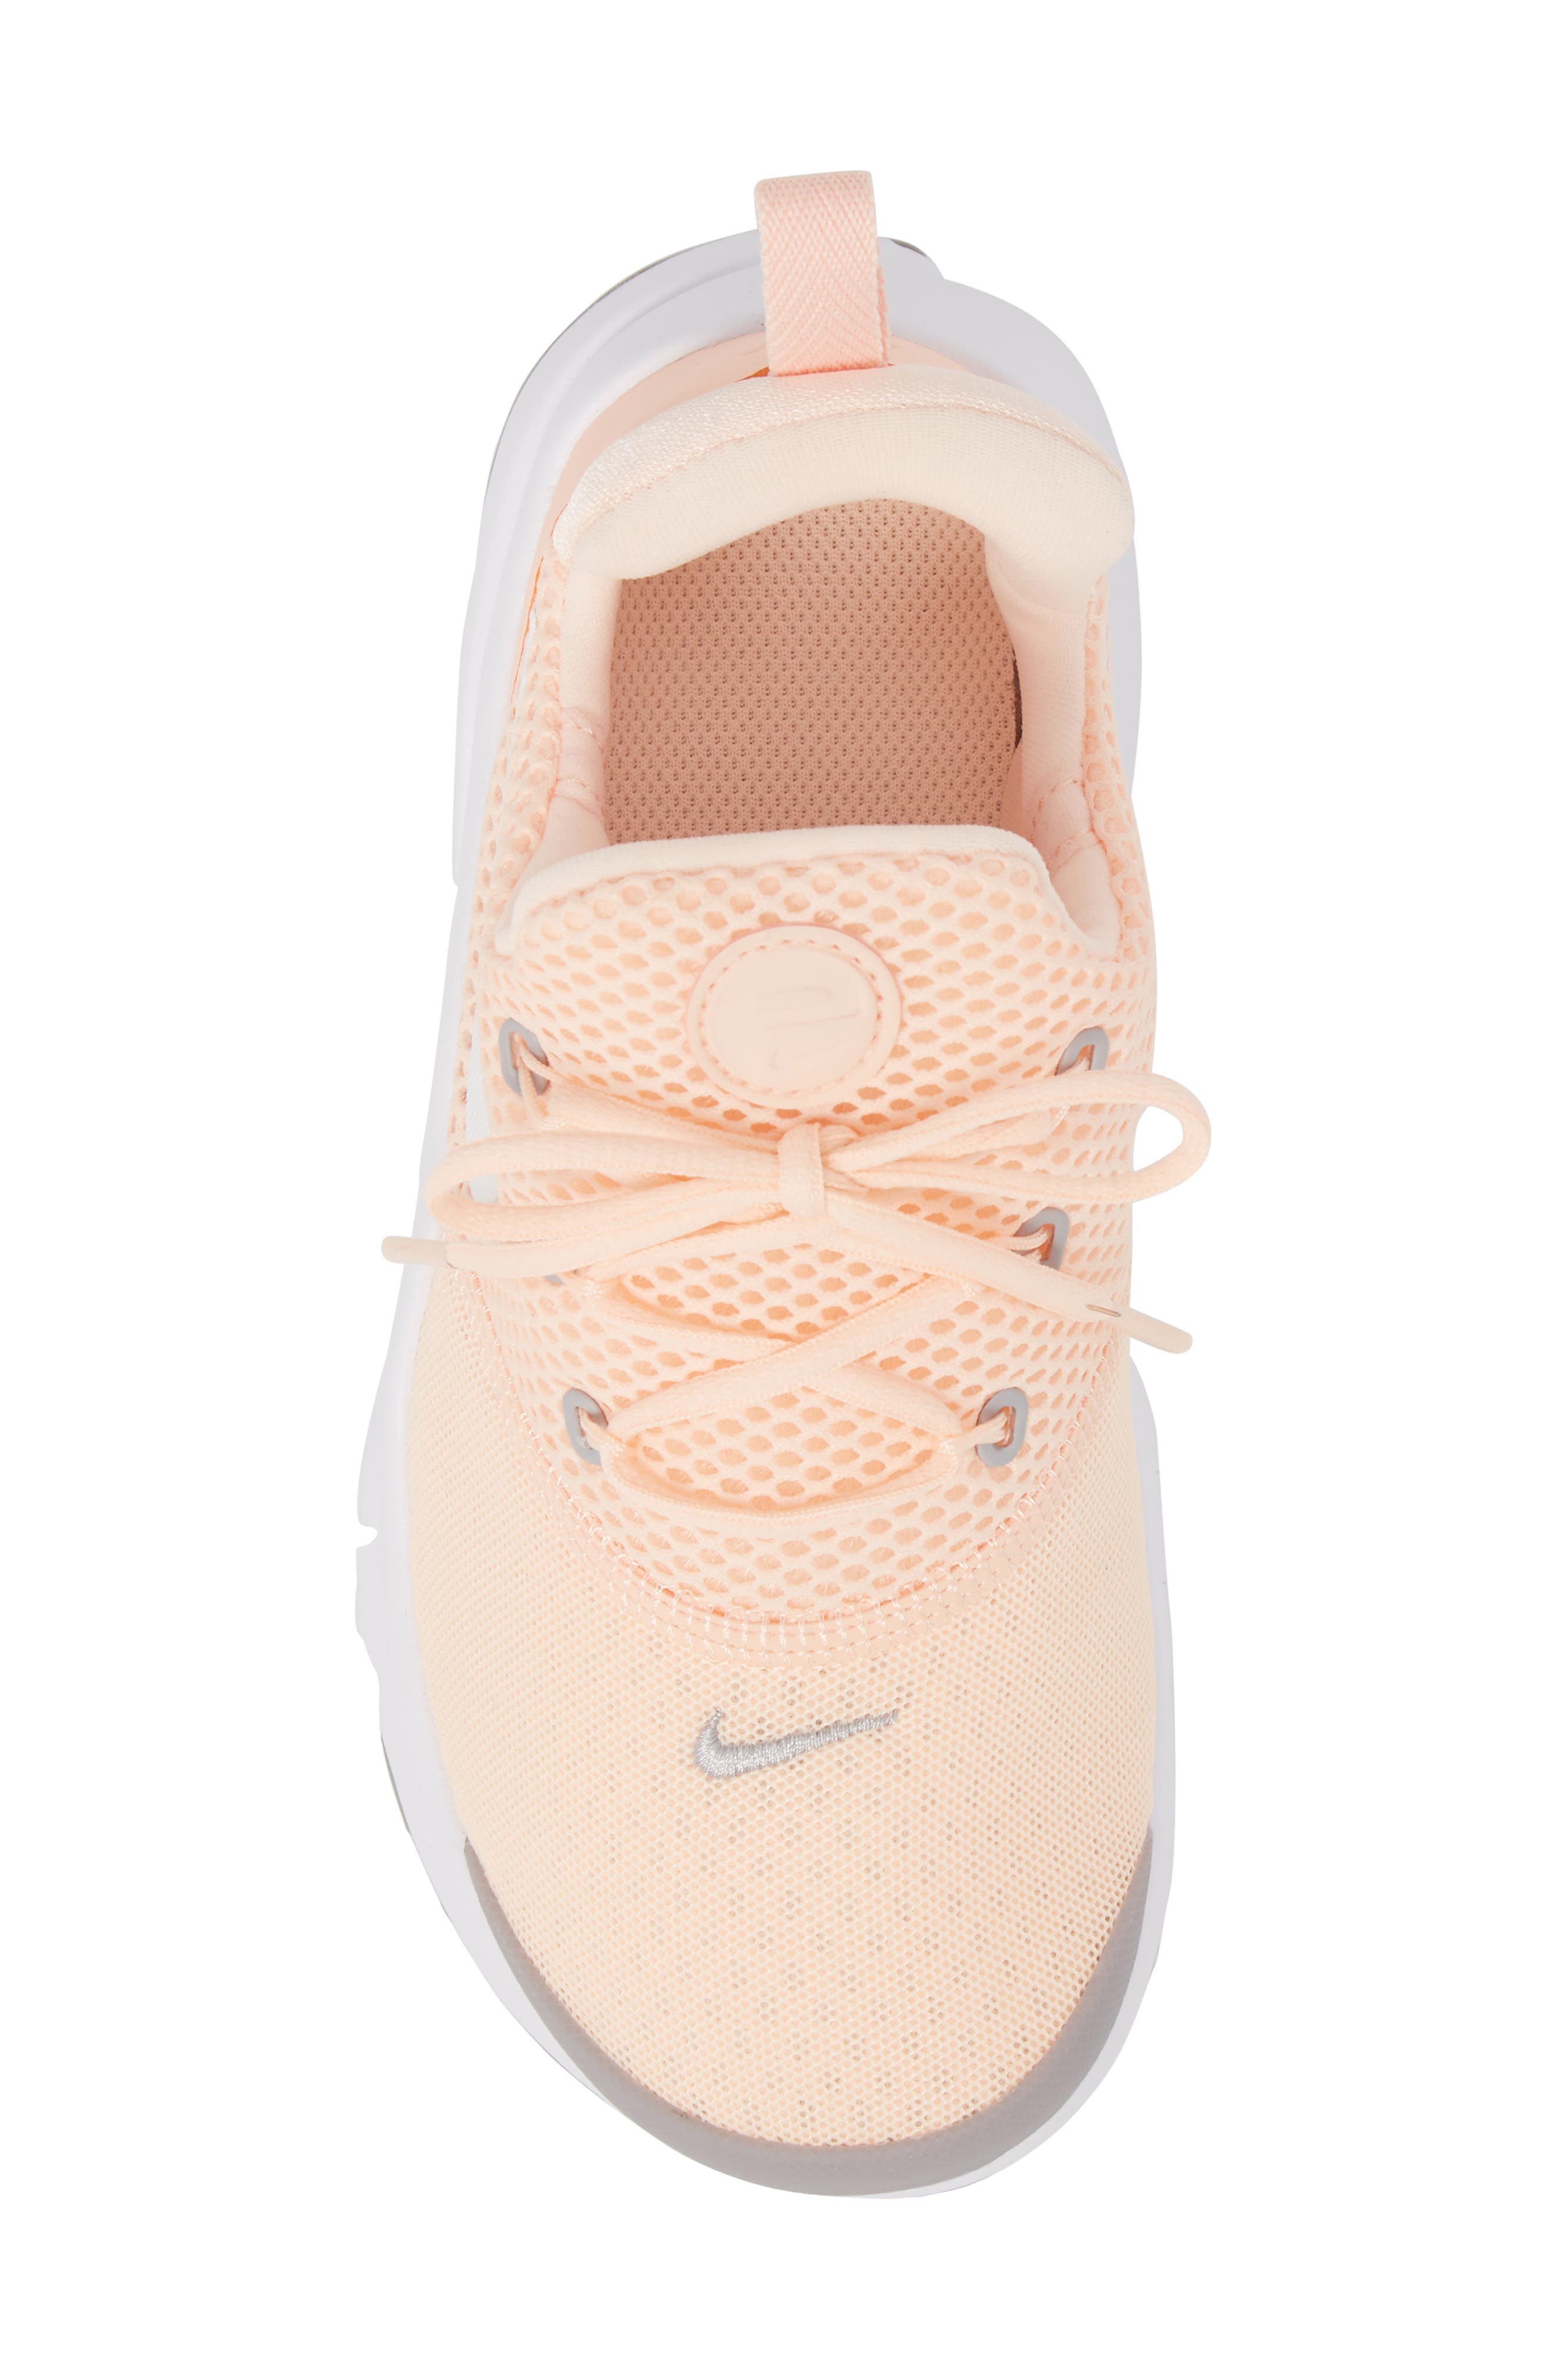 Presto Fly Sneaker,                             Alternate thumbnail 5, color,                             CRIMSON TINT/ WHITE/ GREY